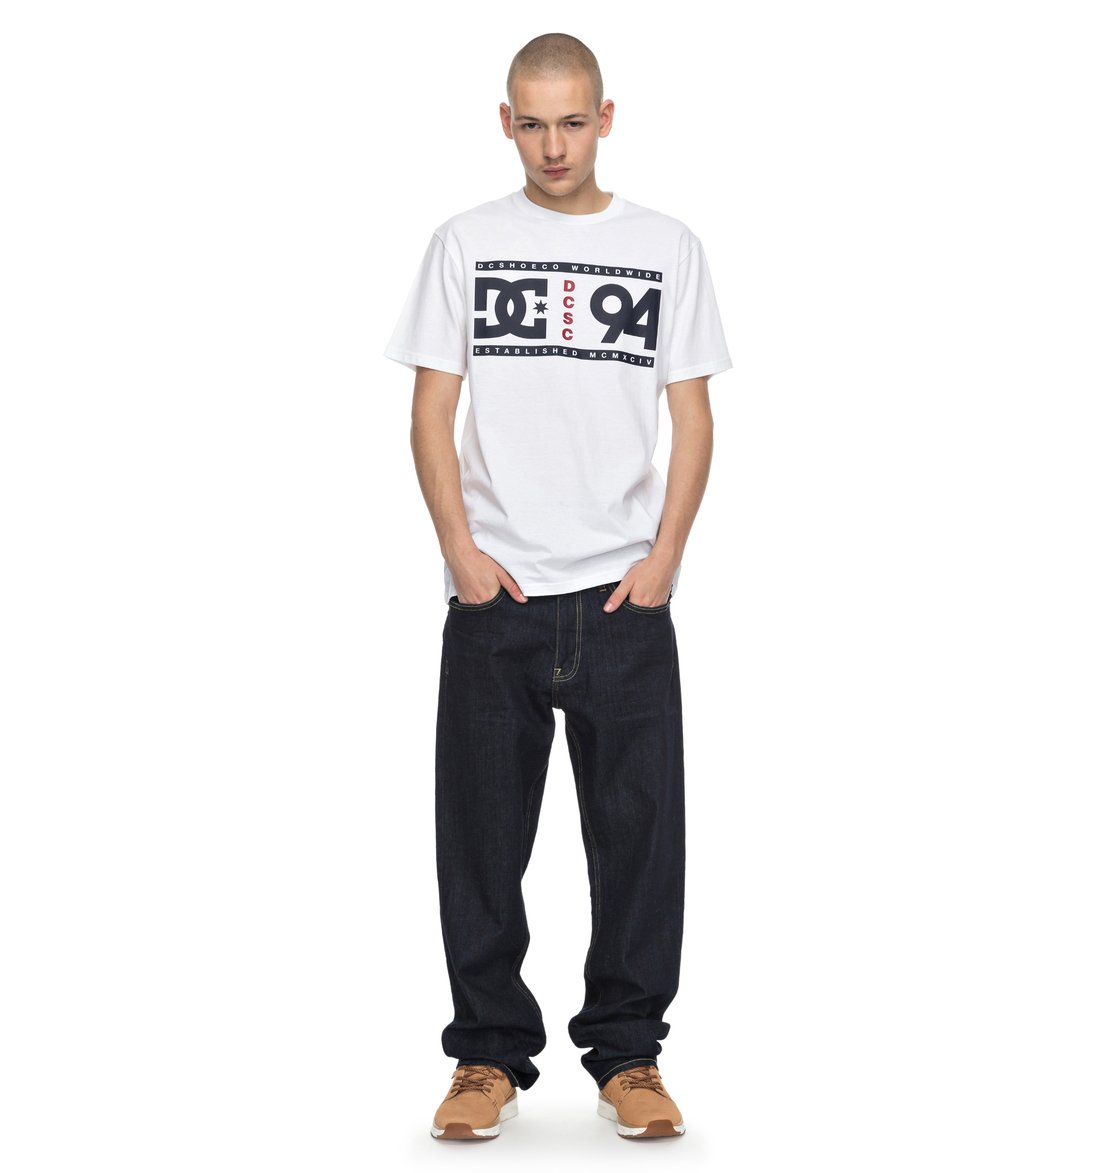 DC-Shoes-Alley-Oop-Camiseta-para-Hombre-EDYZT03691